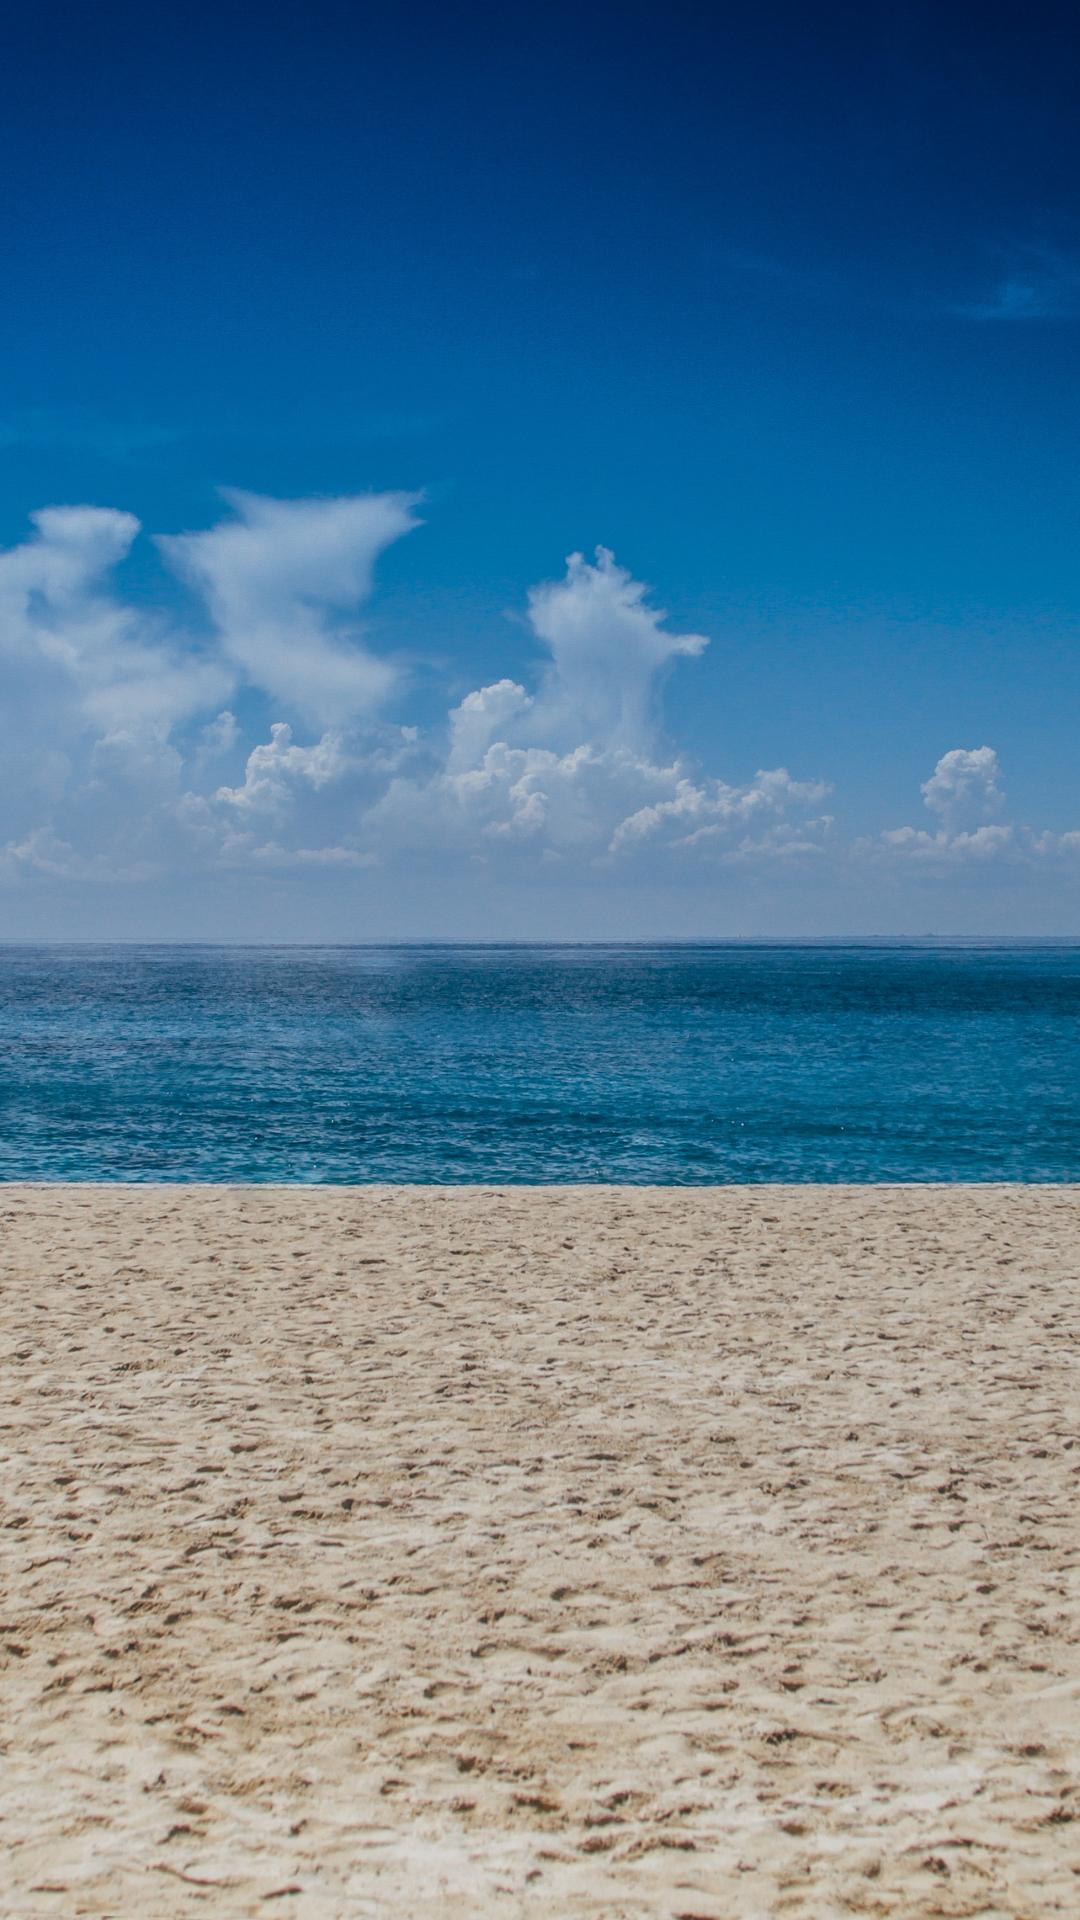 Ocean So Blue IPhone Wallpaper